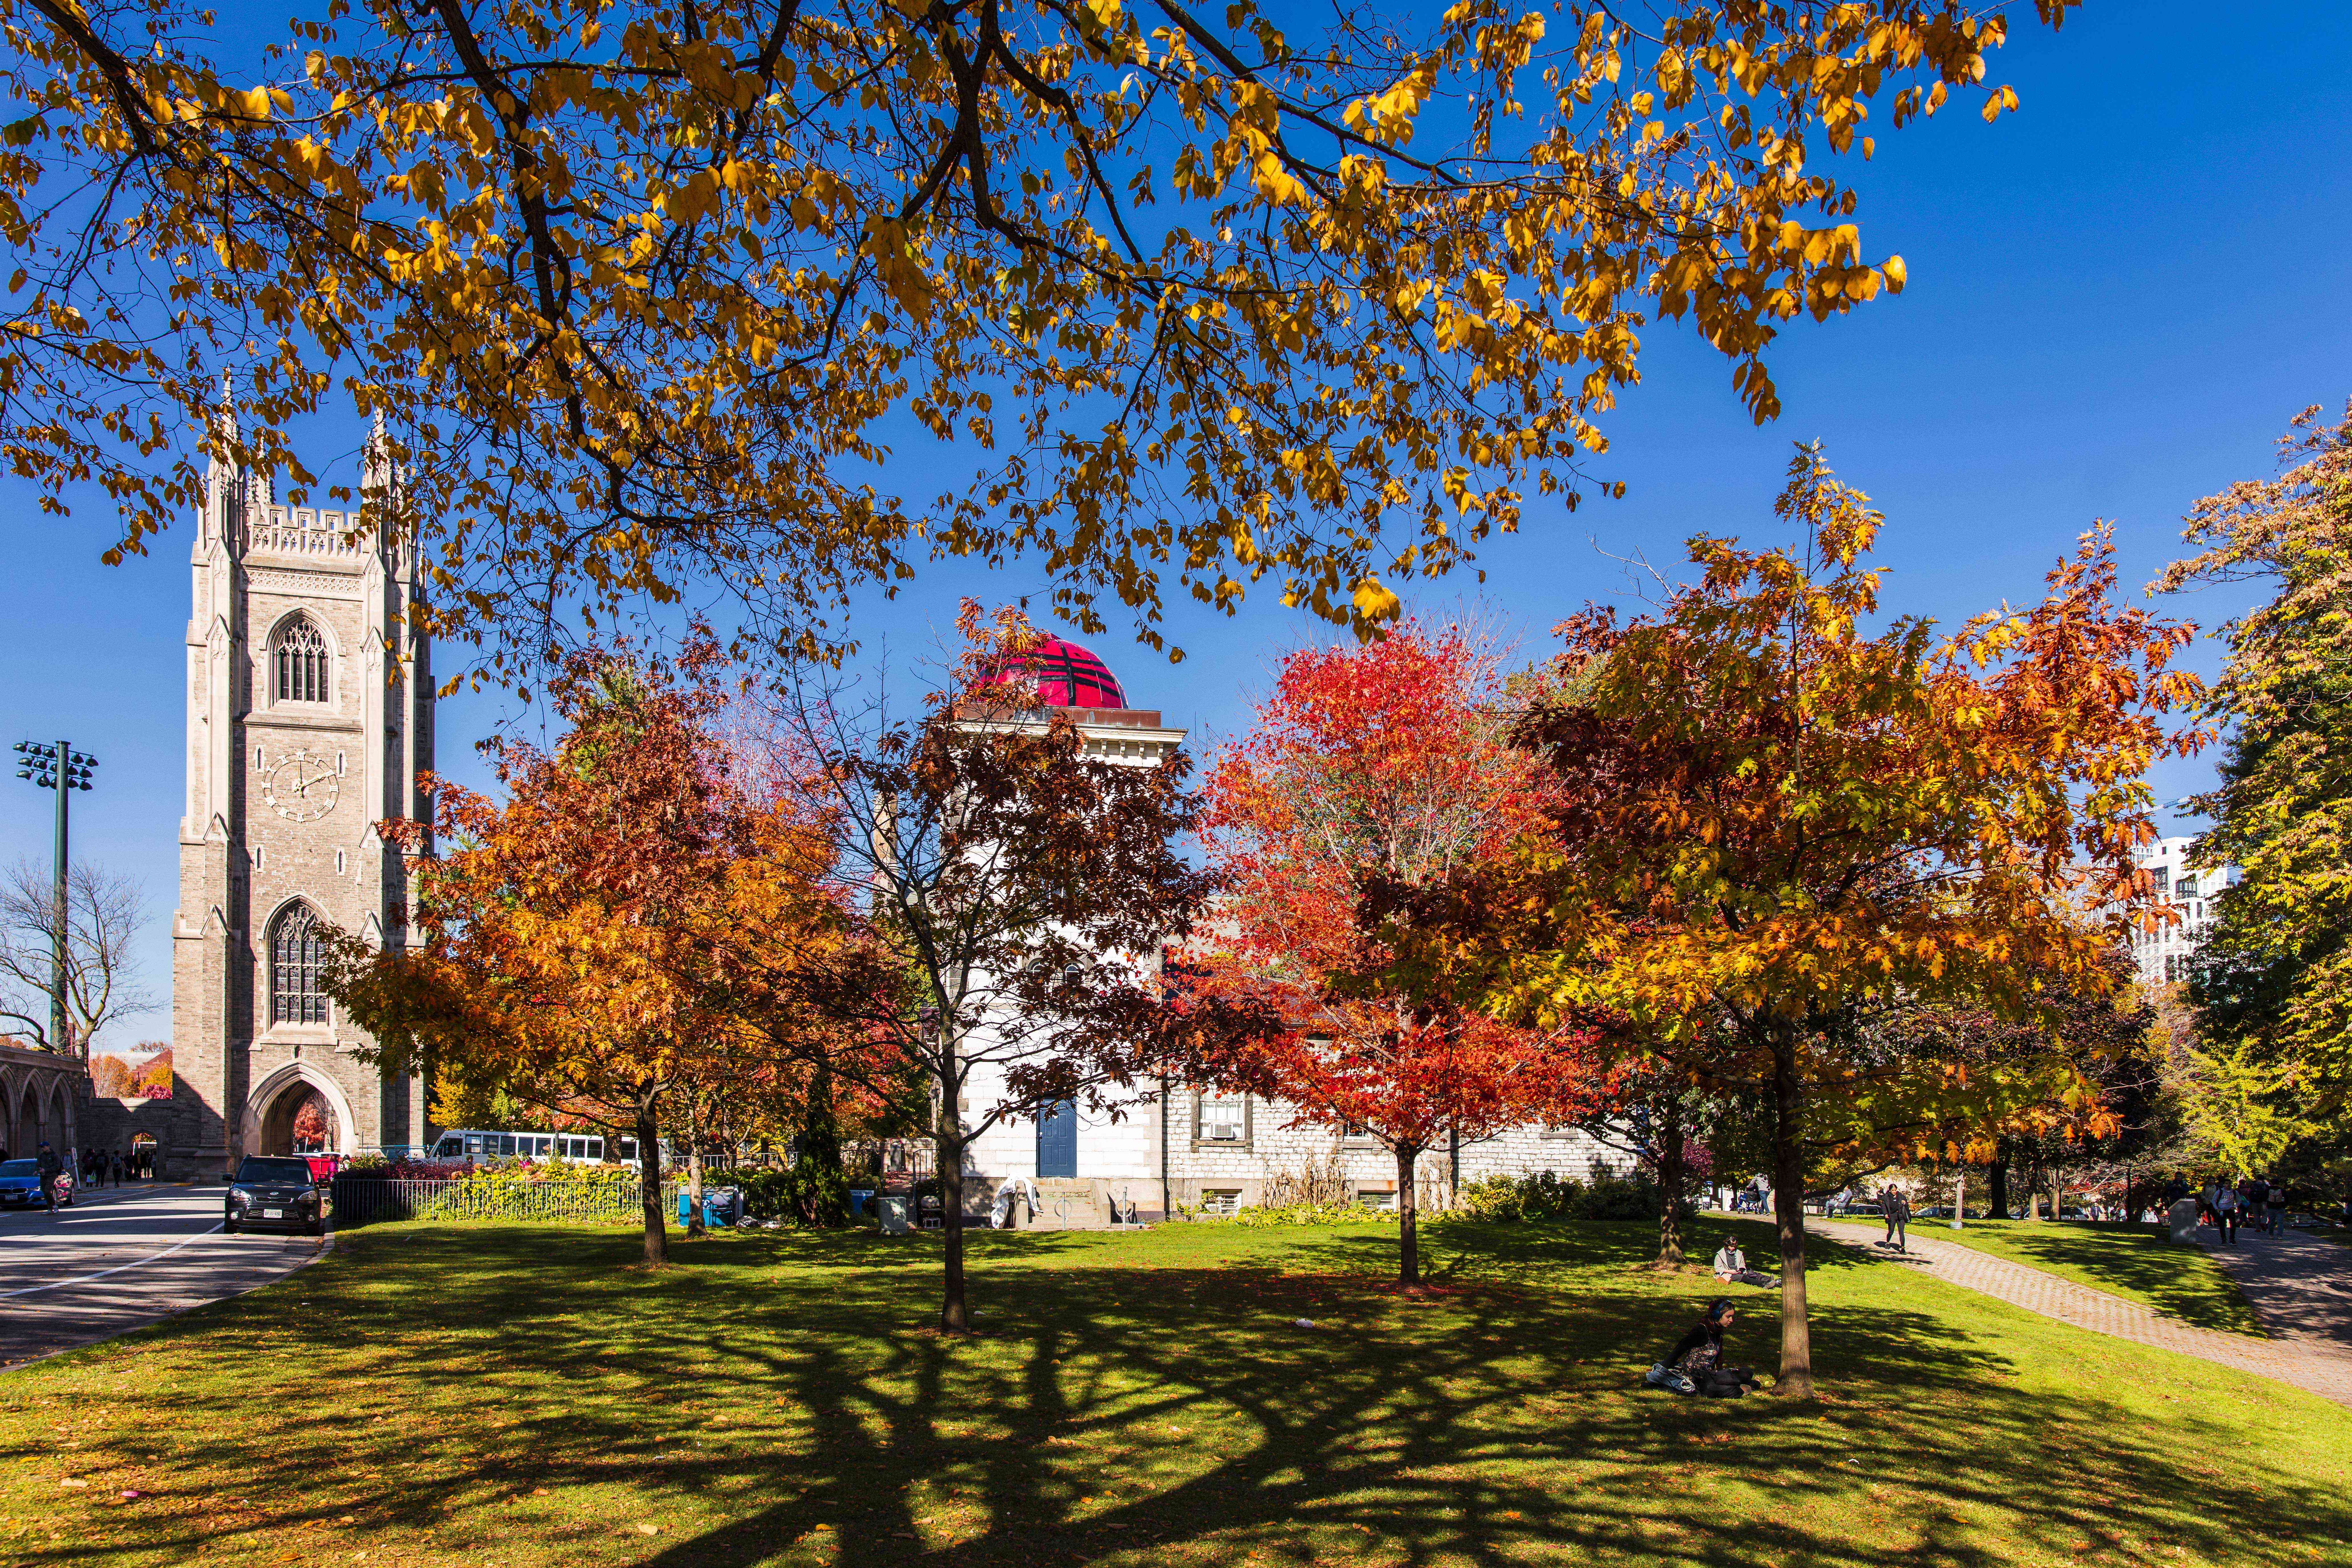 Fall foliage at the University of Toronto